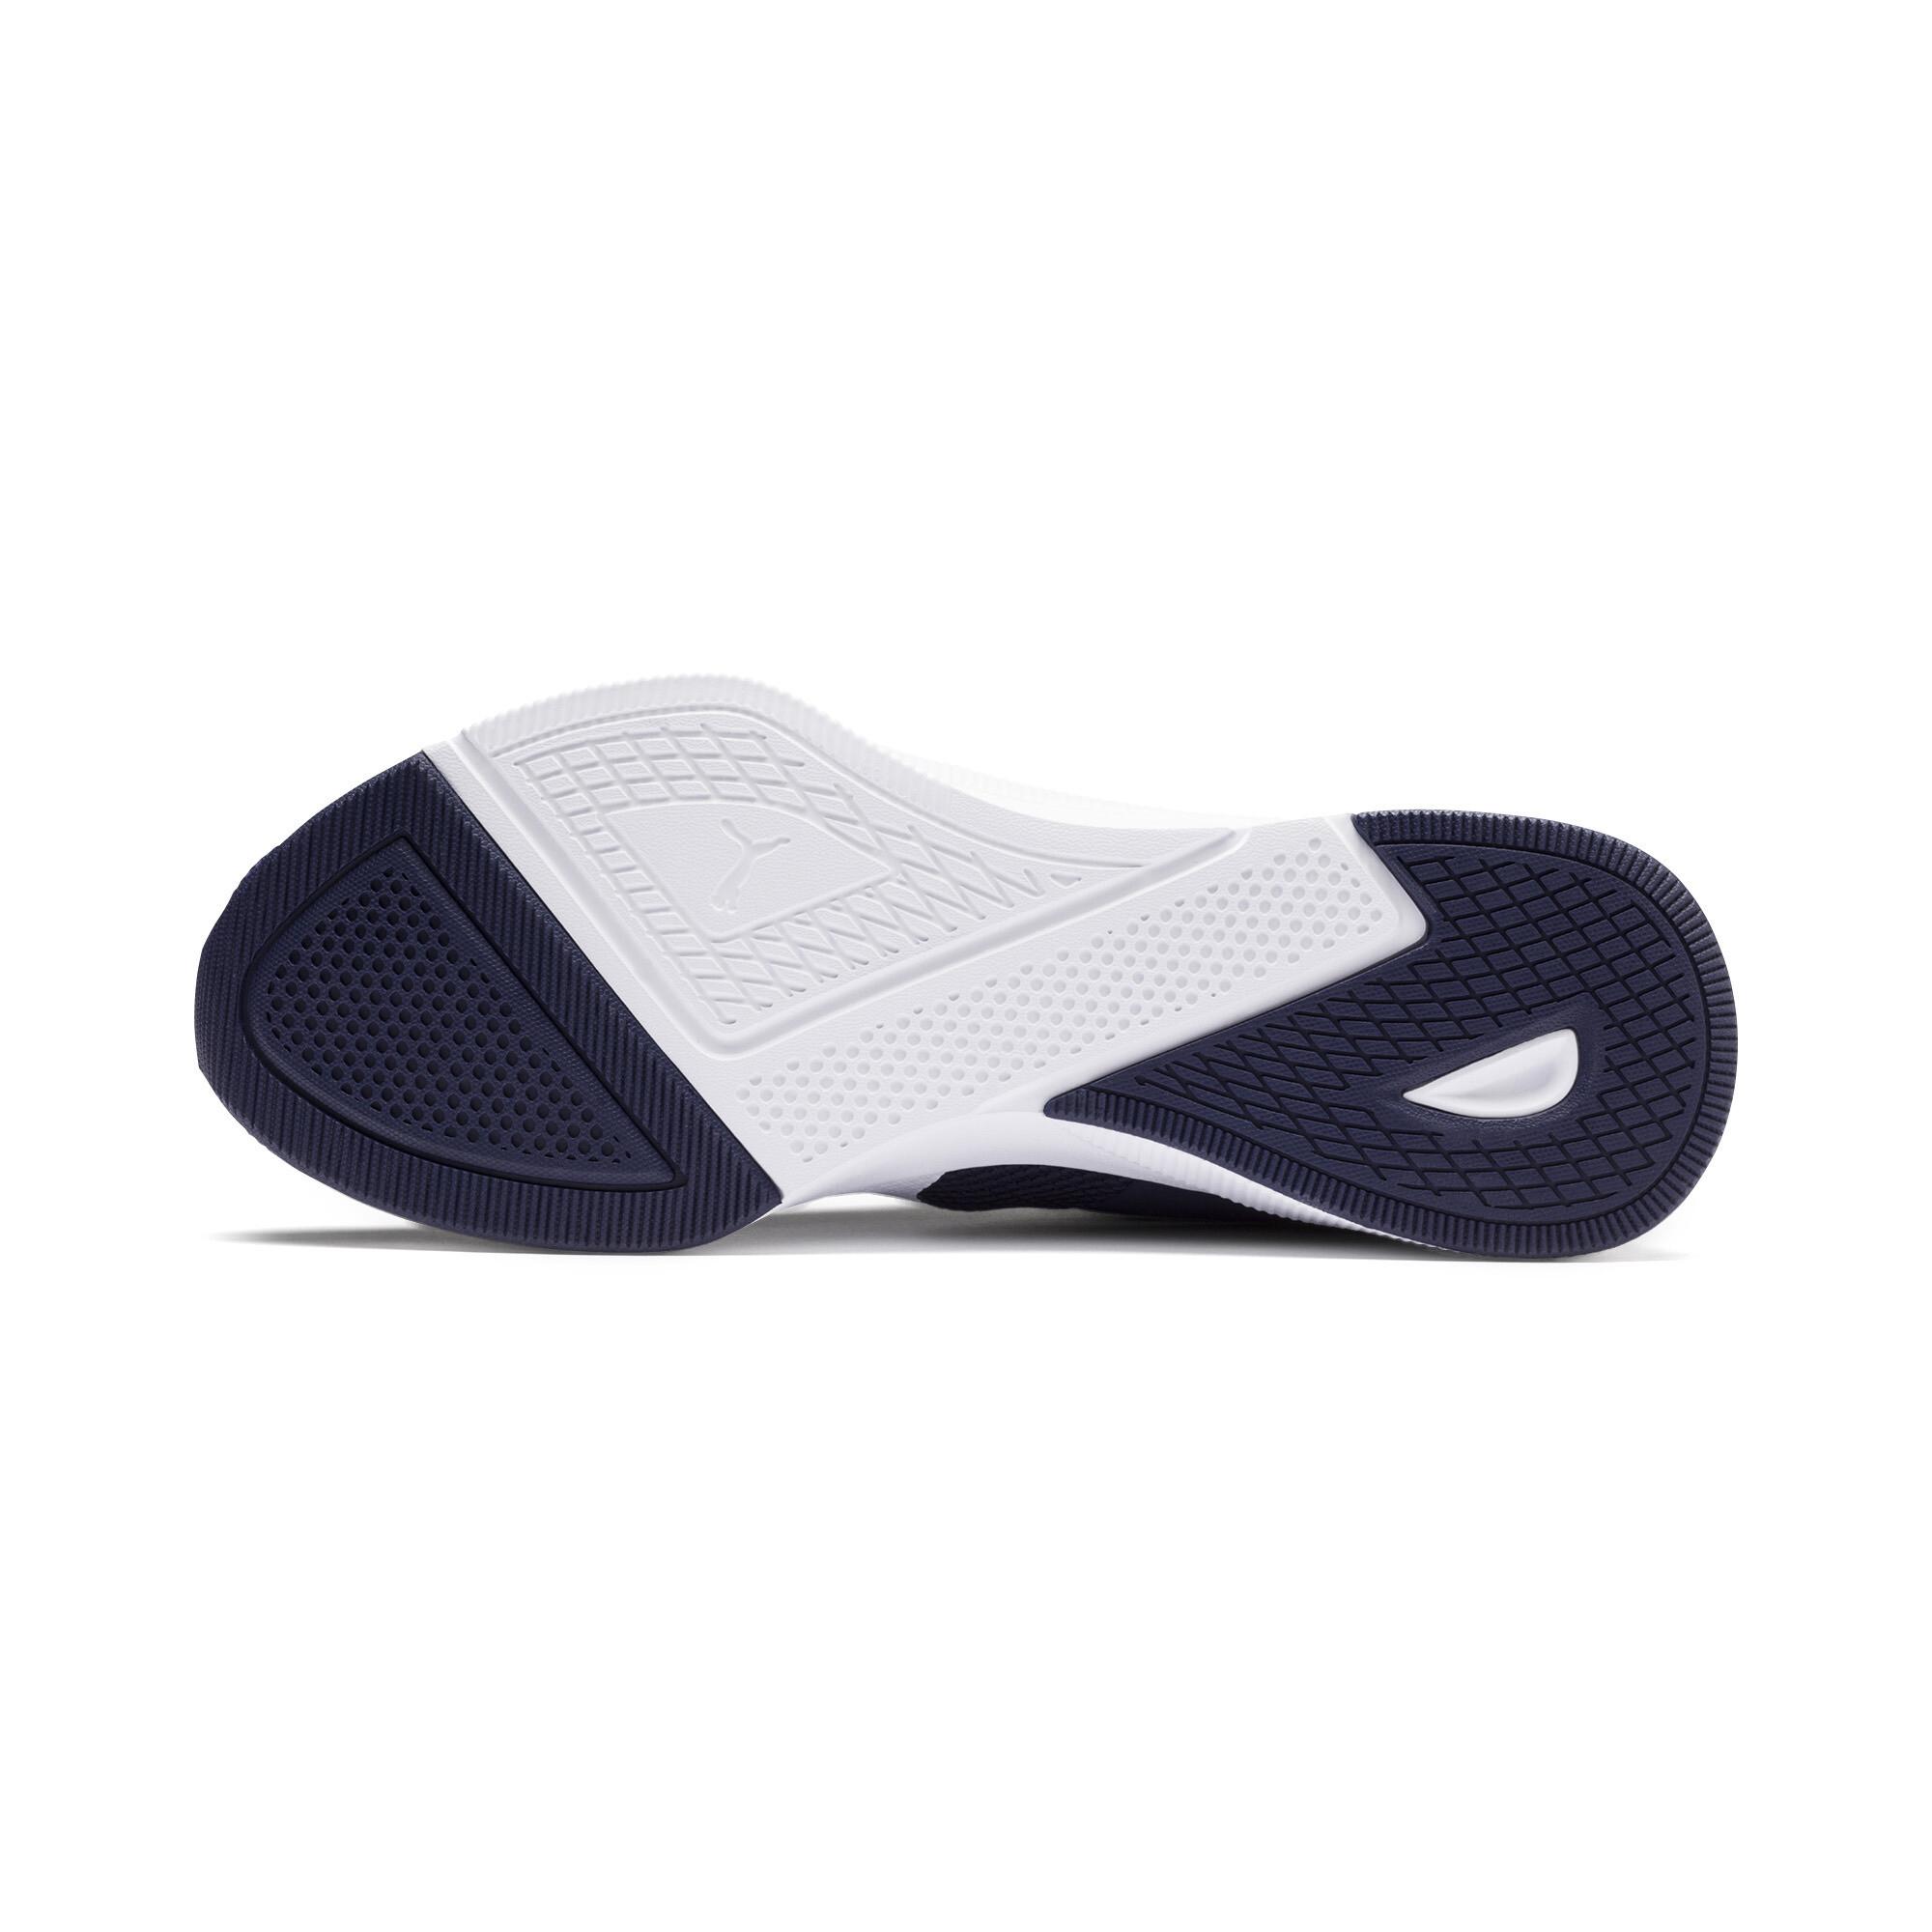 PUMA-Flyer-Runner-Running-Shoes-Mens-Shoe-Running thumbnail 11